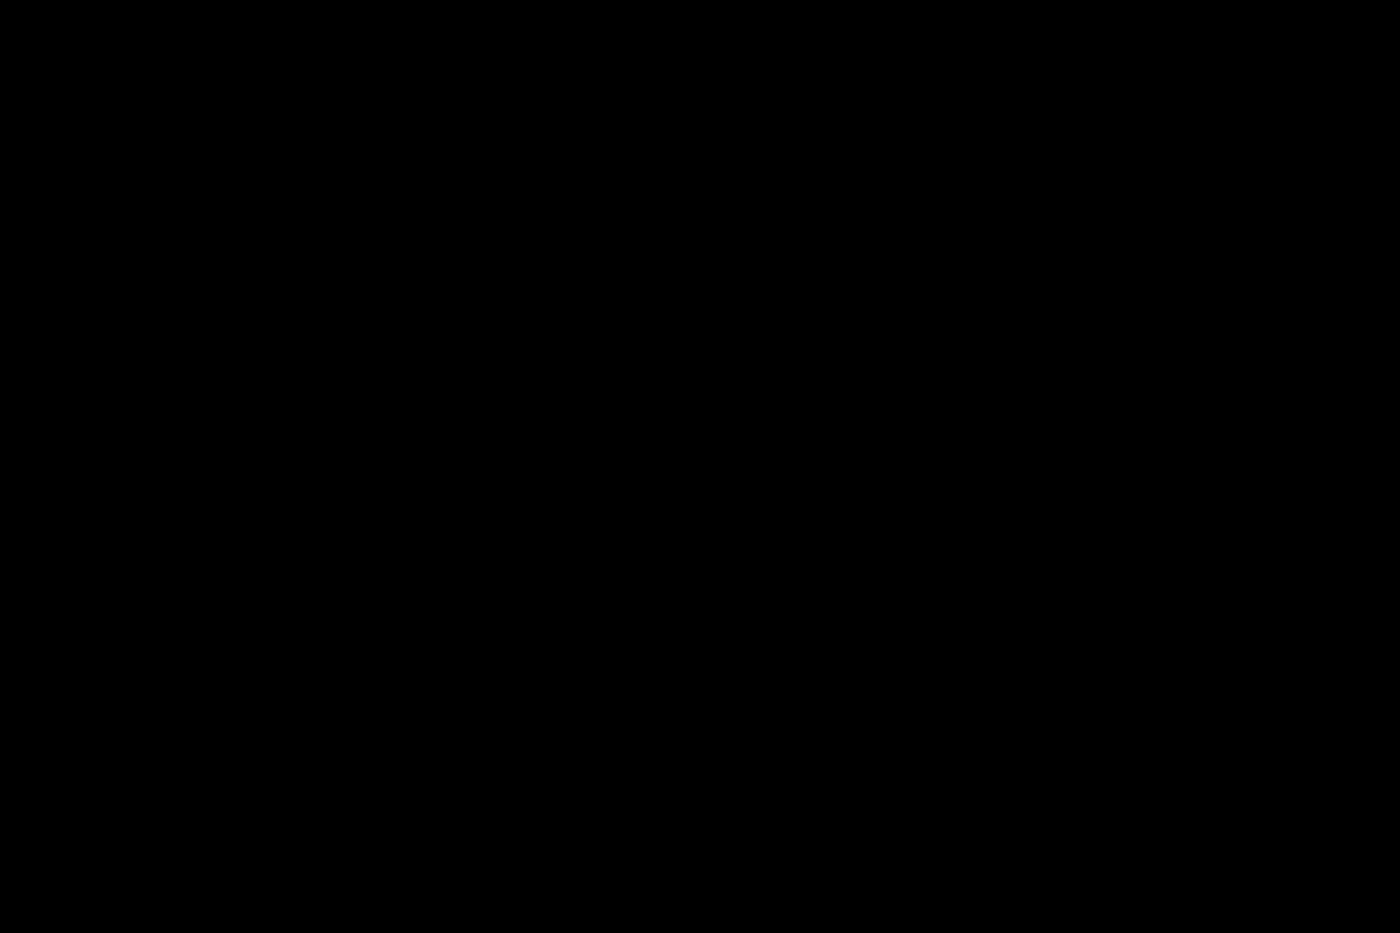 txt_1967_enbw_jp_bilsterberg_paulgaertner_web